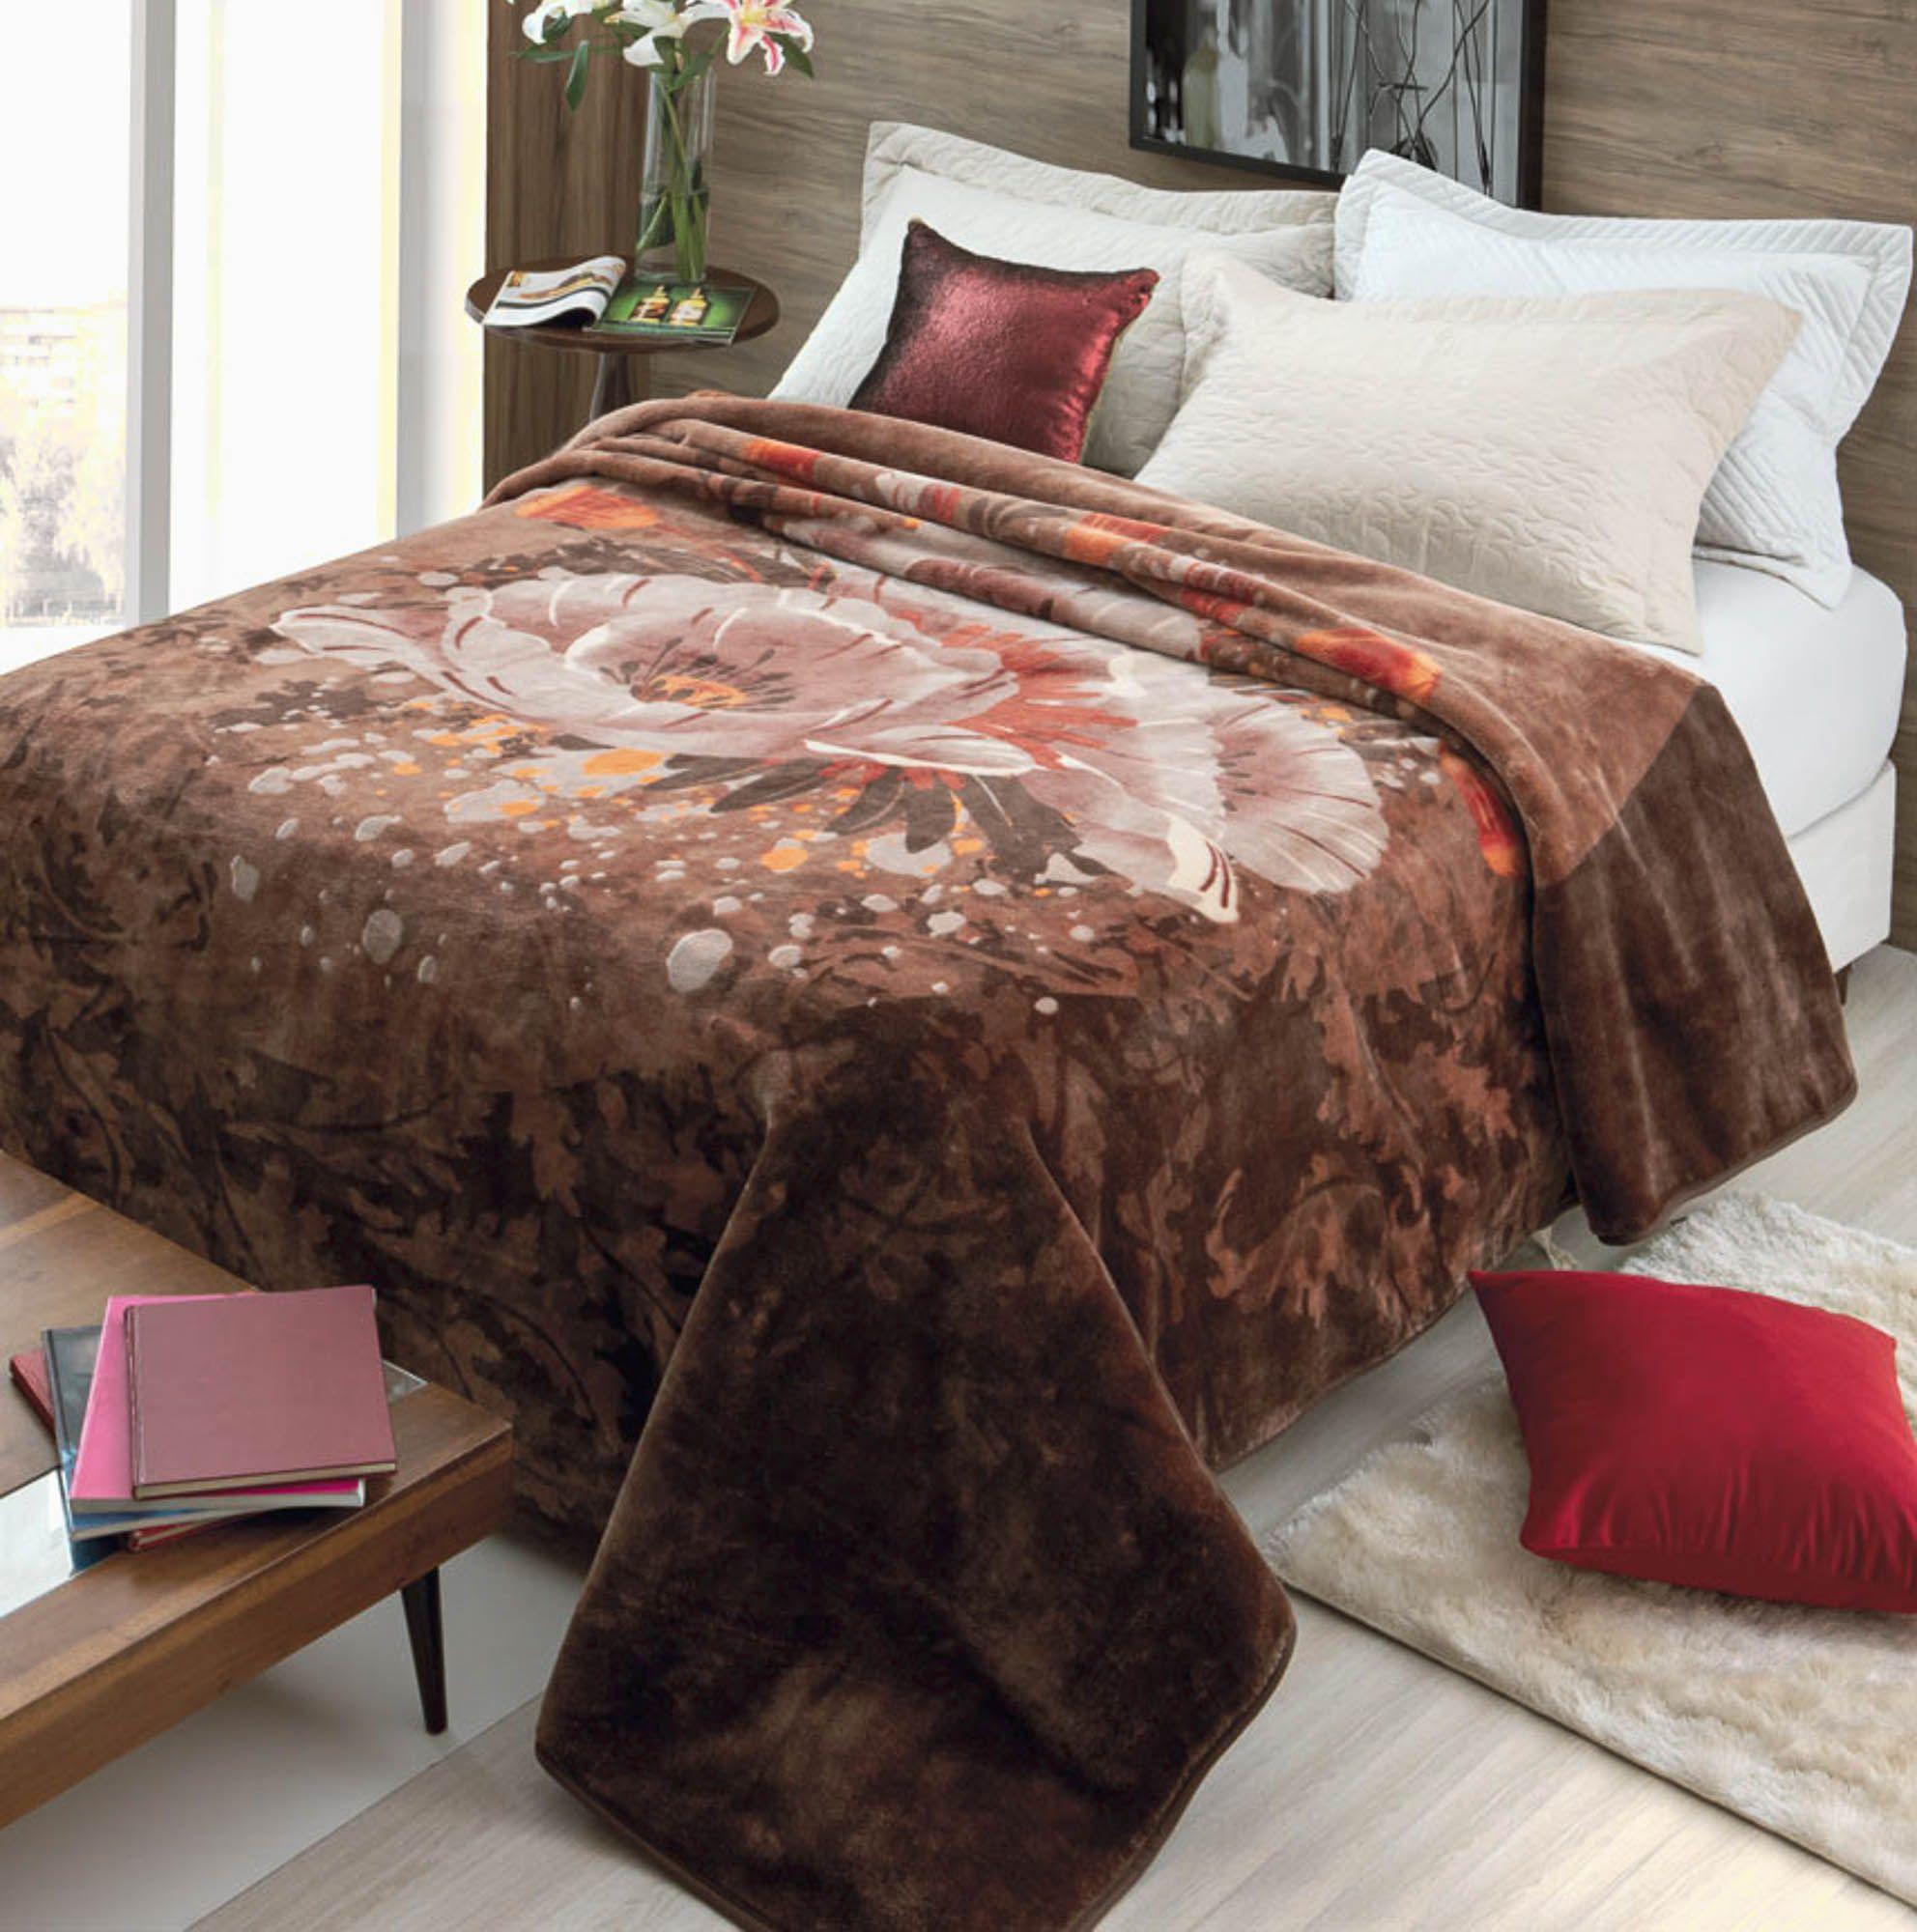 Cobertor Jolitex Raschel King 2,20x2,40m Fragrancia